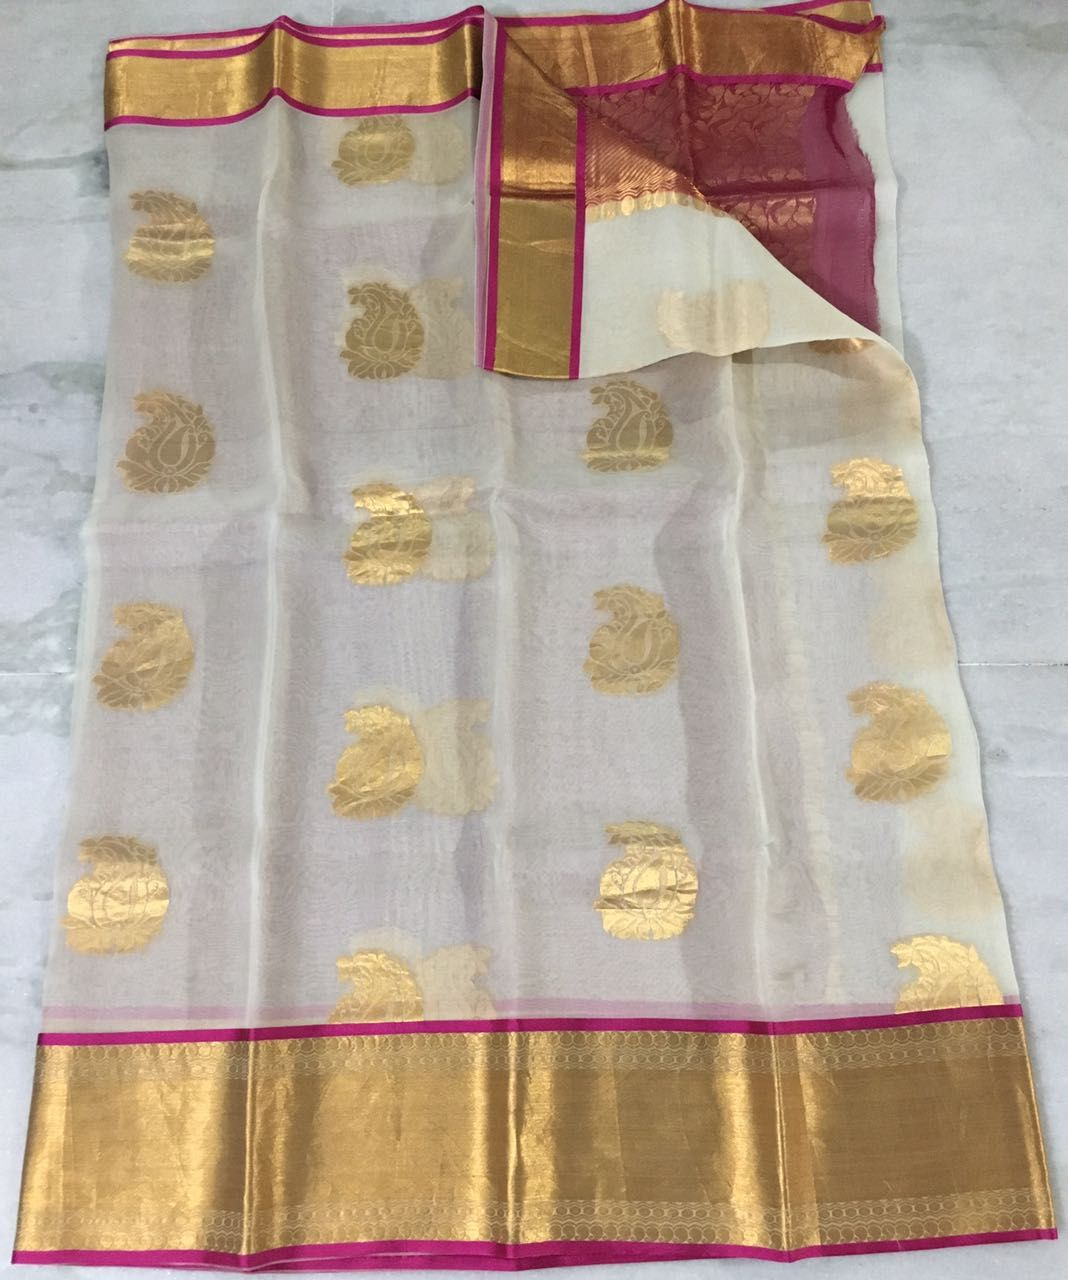 02964f5298de83 Pure Organza Silk Sarees Buy Online https://slokaonline.com/collections/